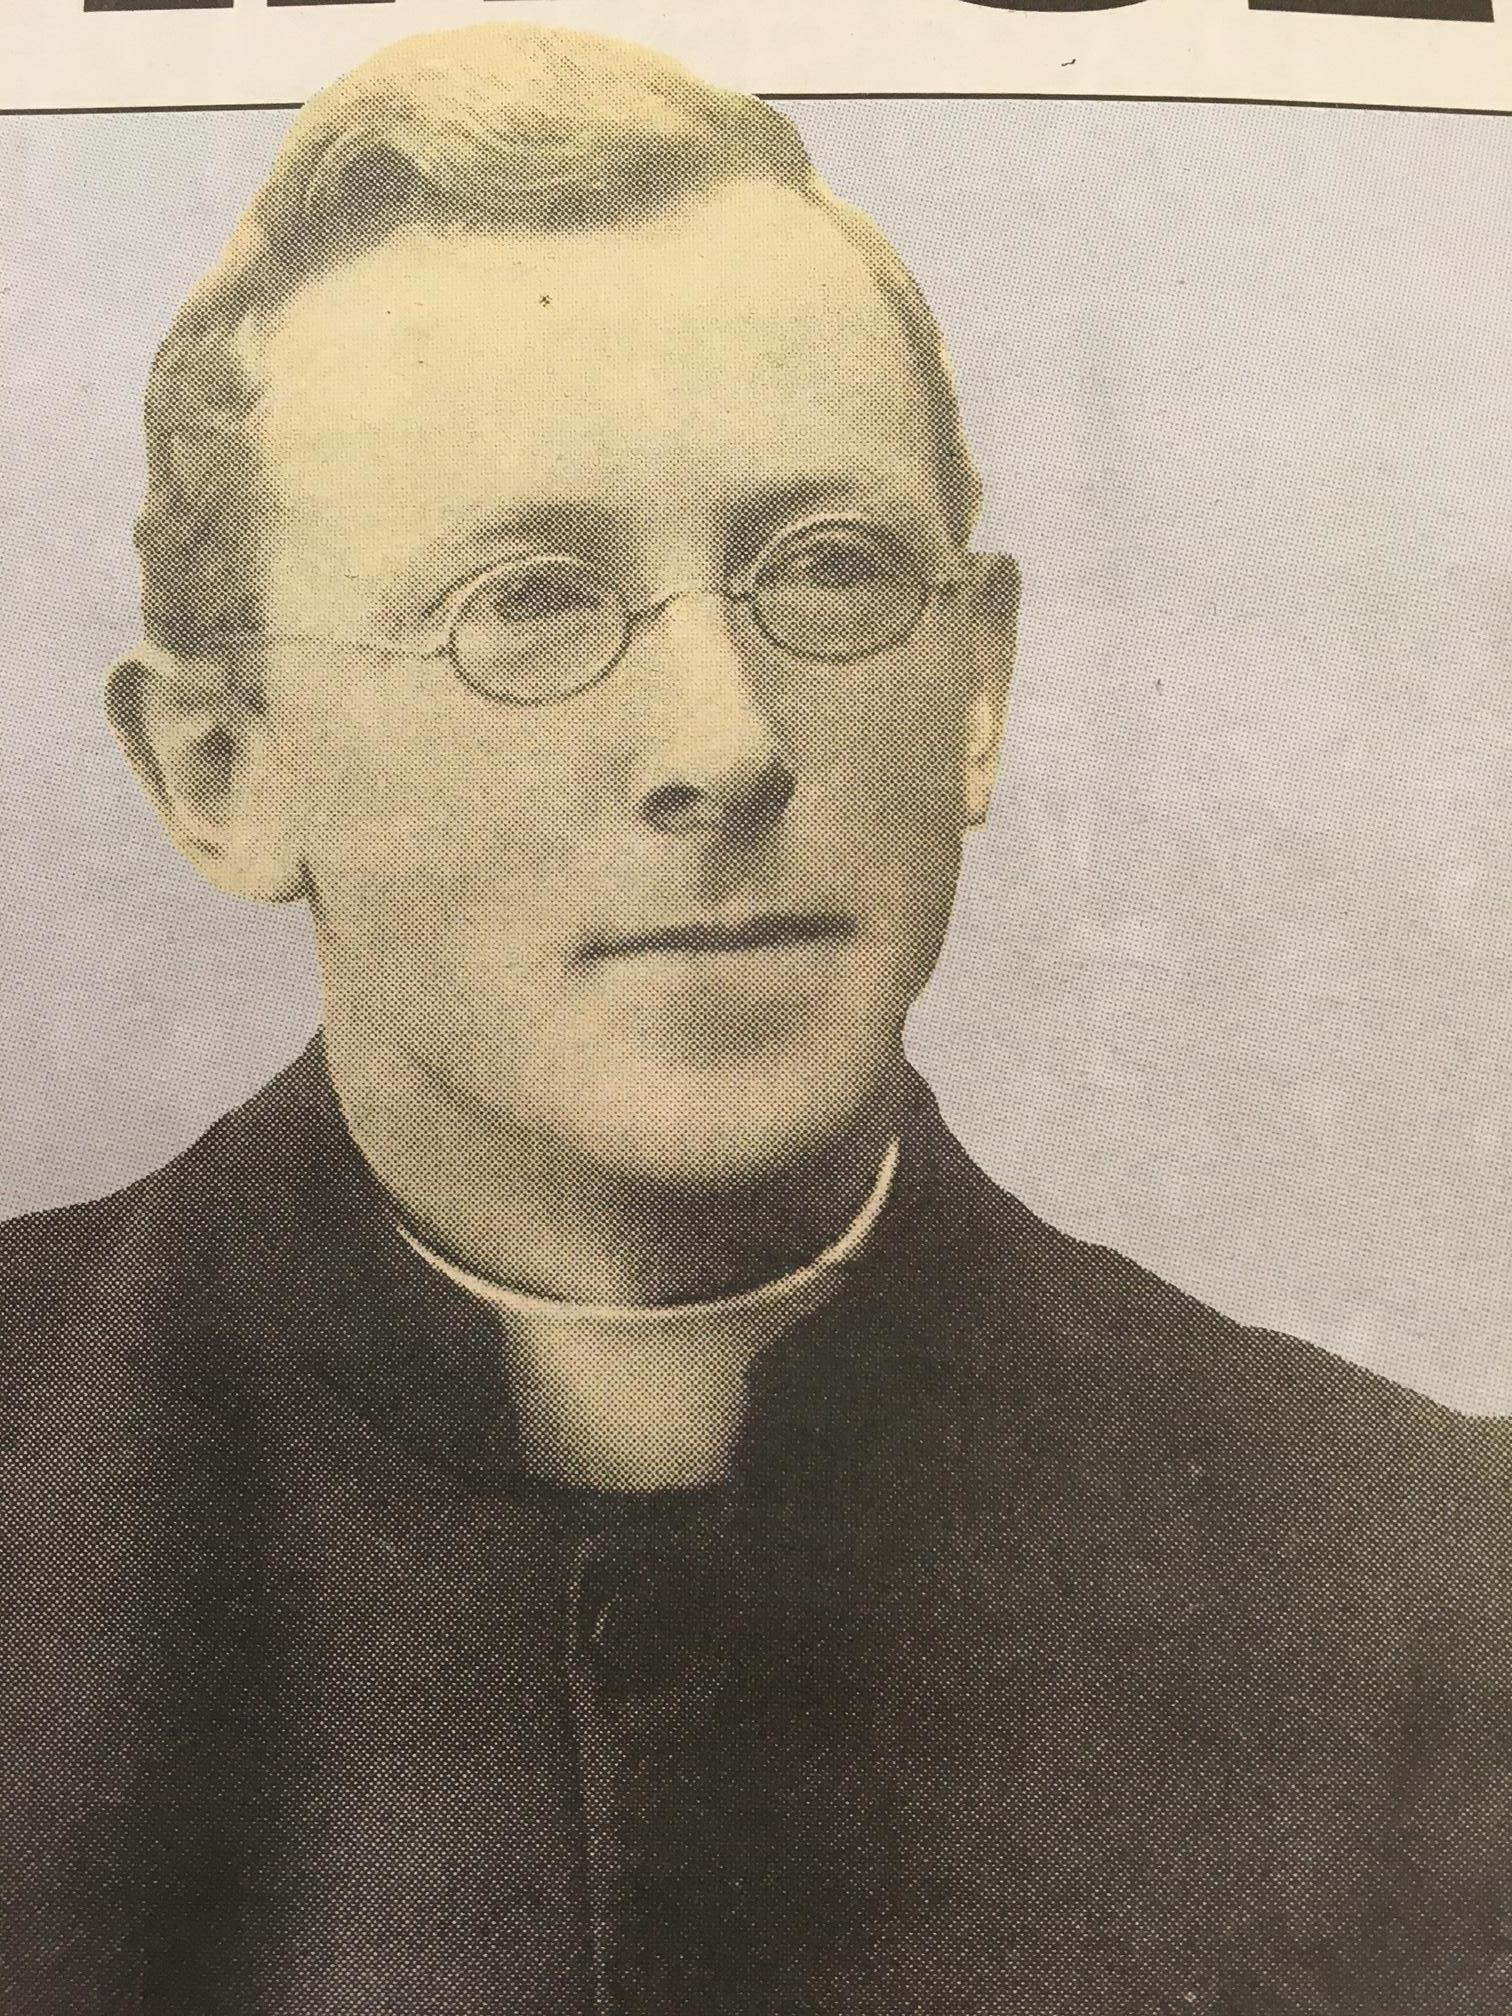 866b. Fr Aengus MacSweeney, Author of Poverty in Cork, 1917